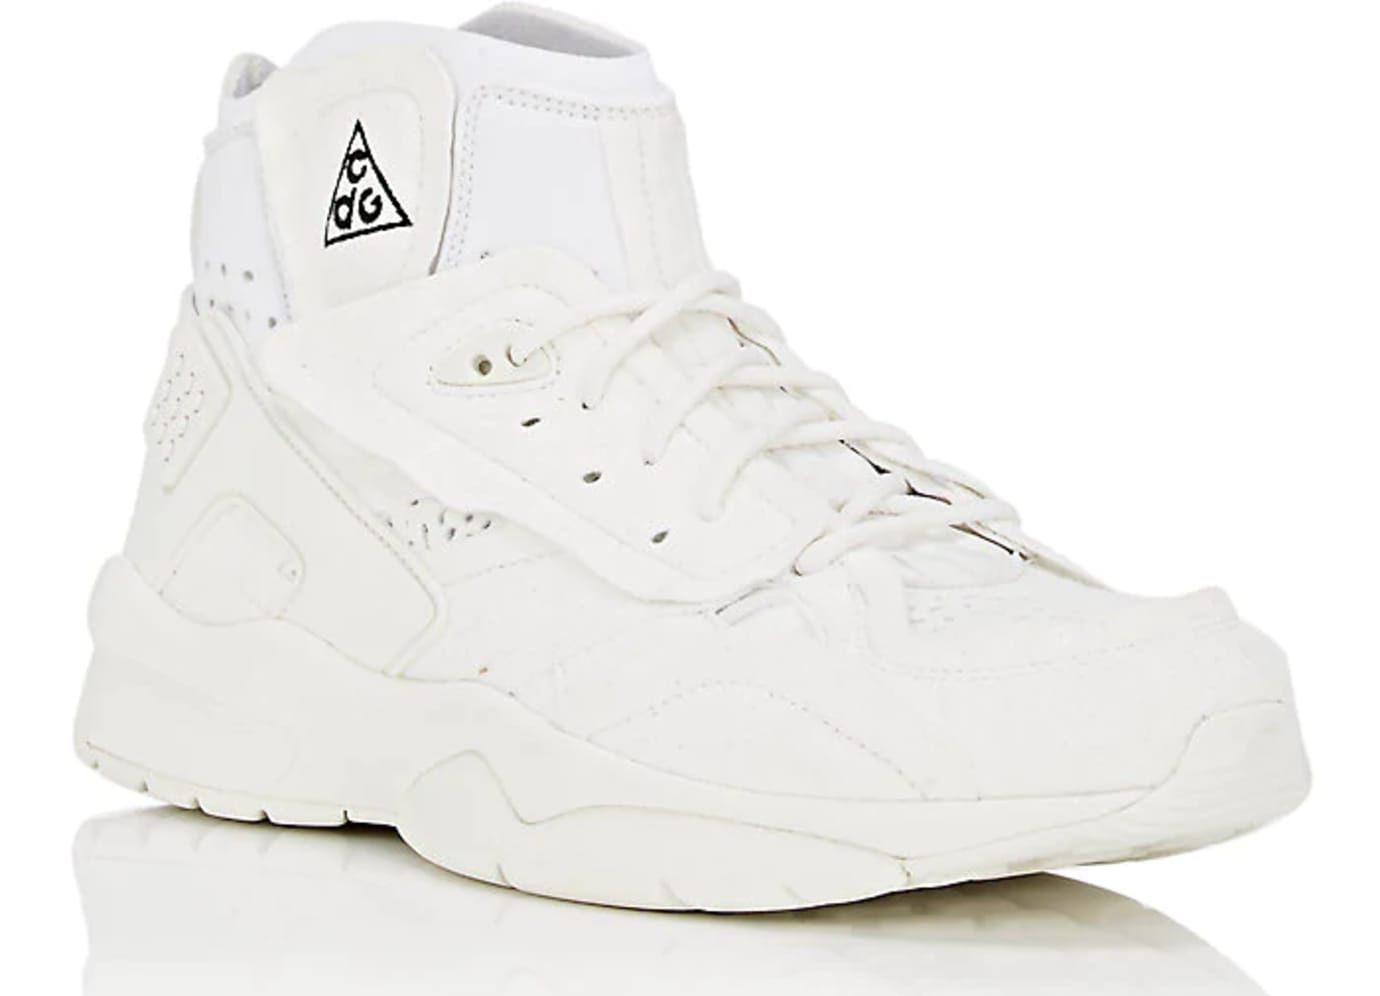 Comme des Garçons x Nike Air Mowabb (Toe)